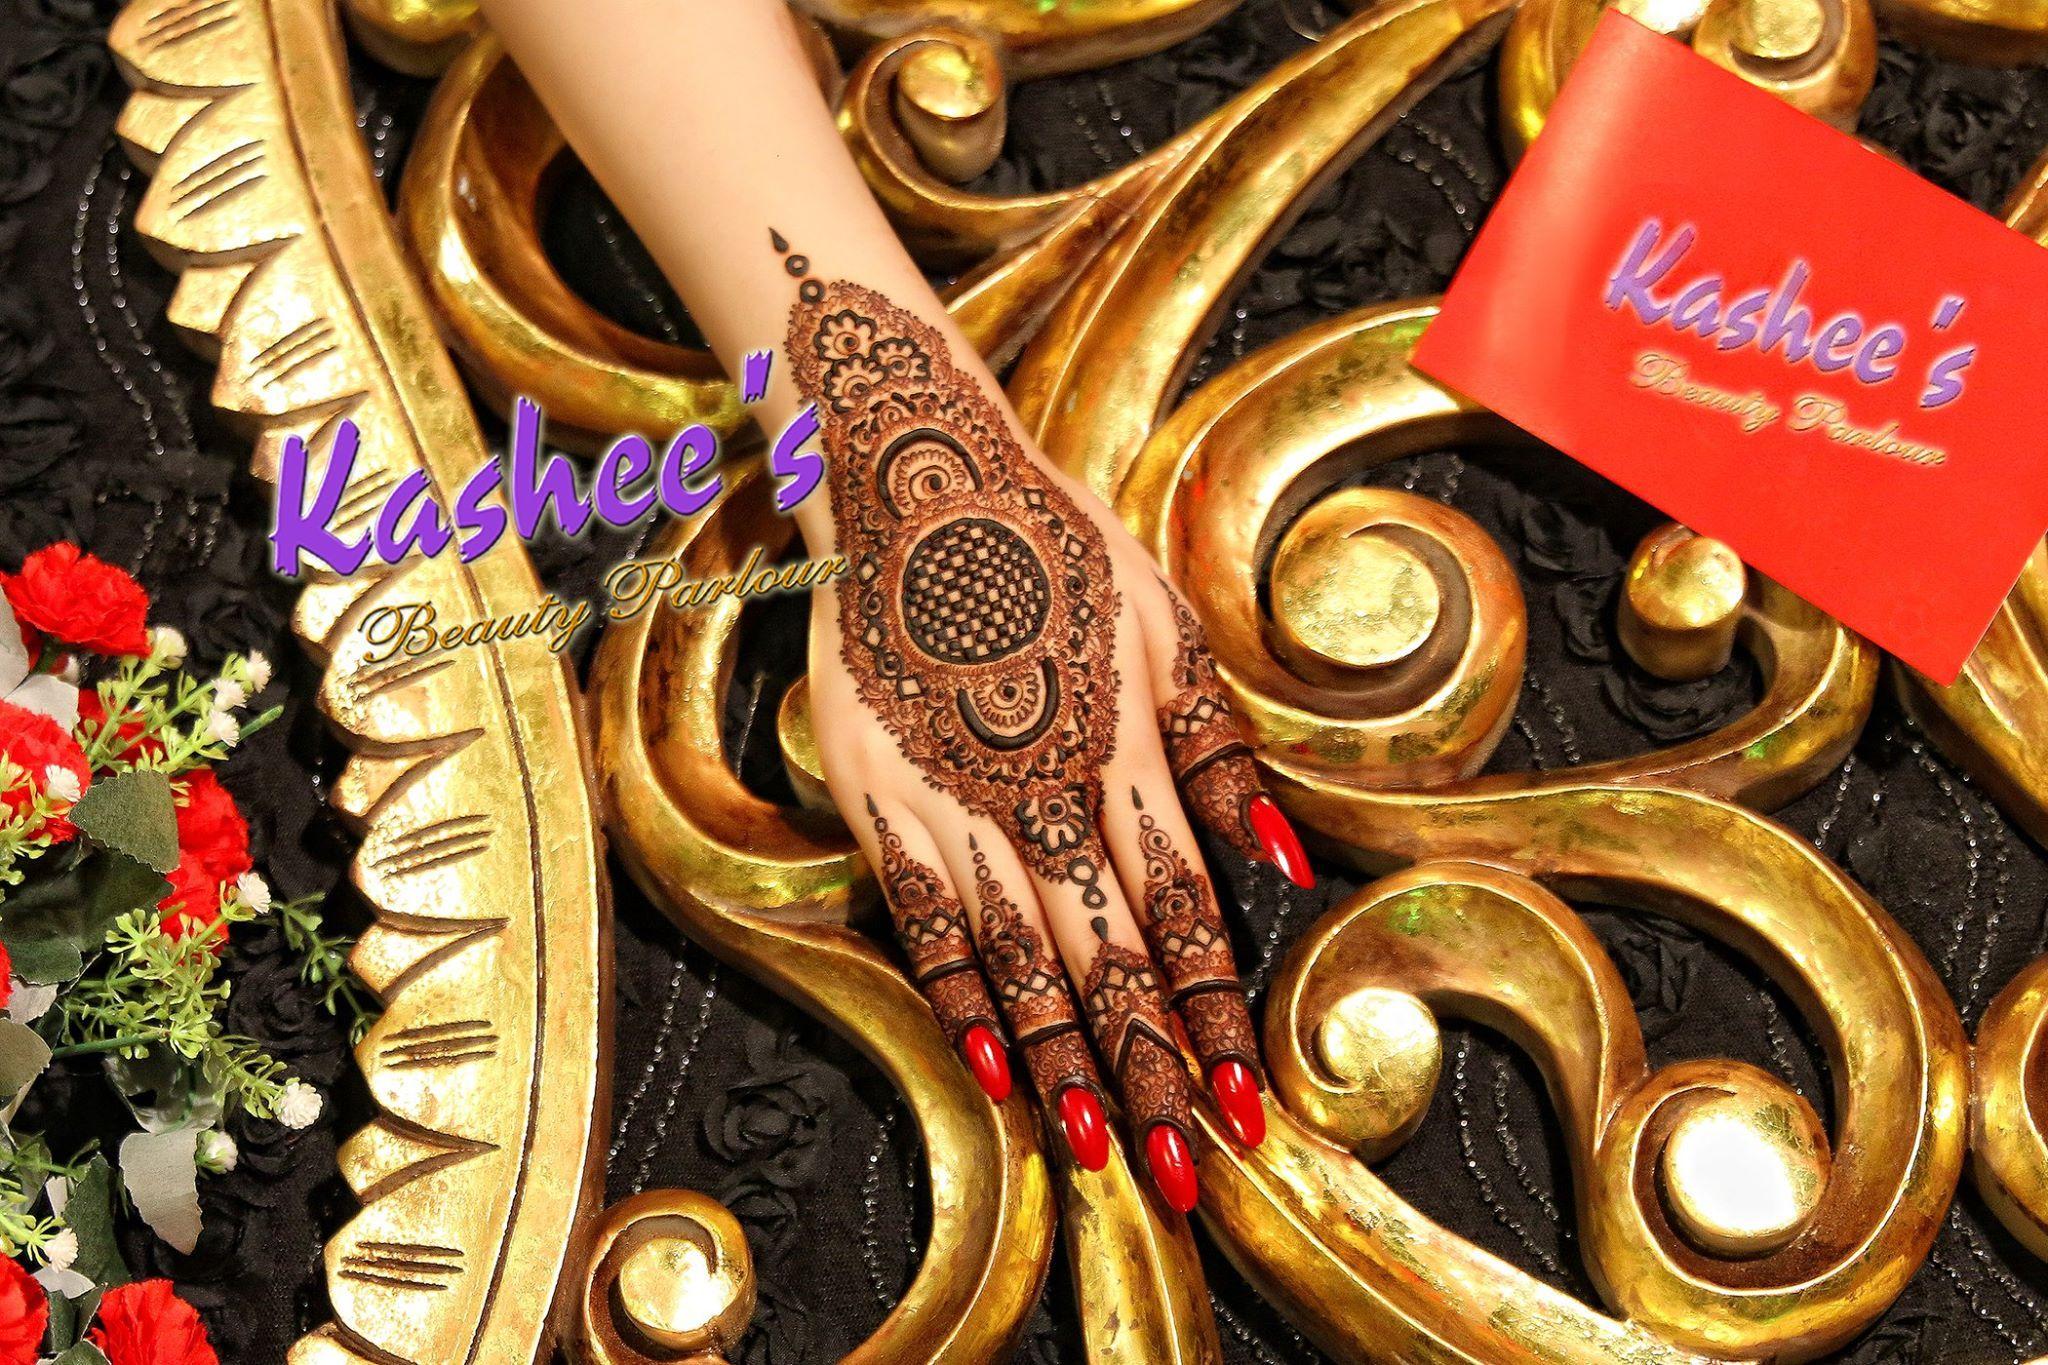 Bridal Mehndi Rates In Karachi : Design by kashee s beauty parlour bridal mehndi designs